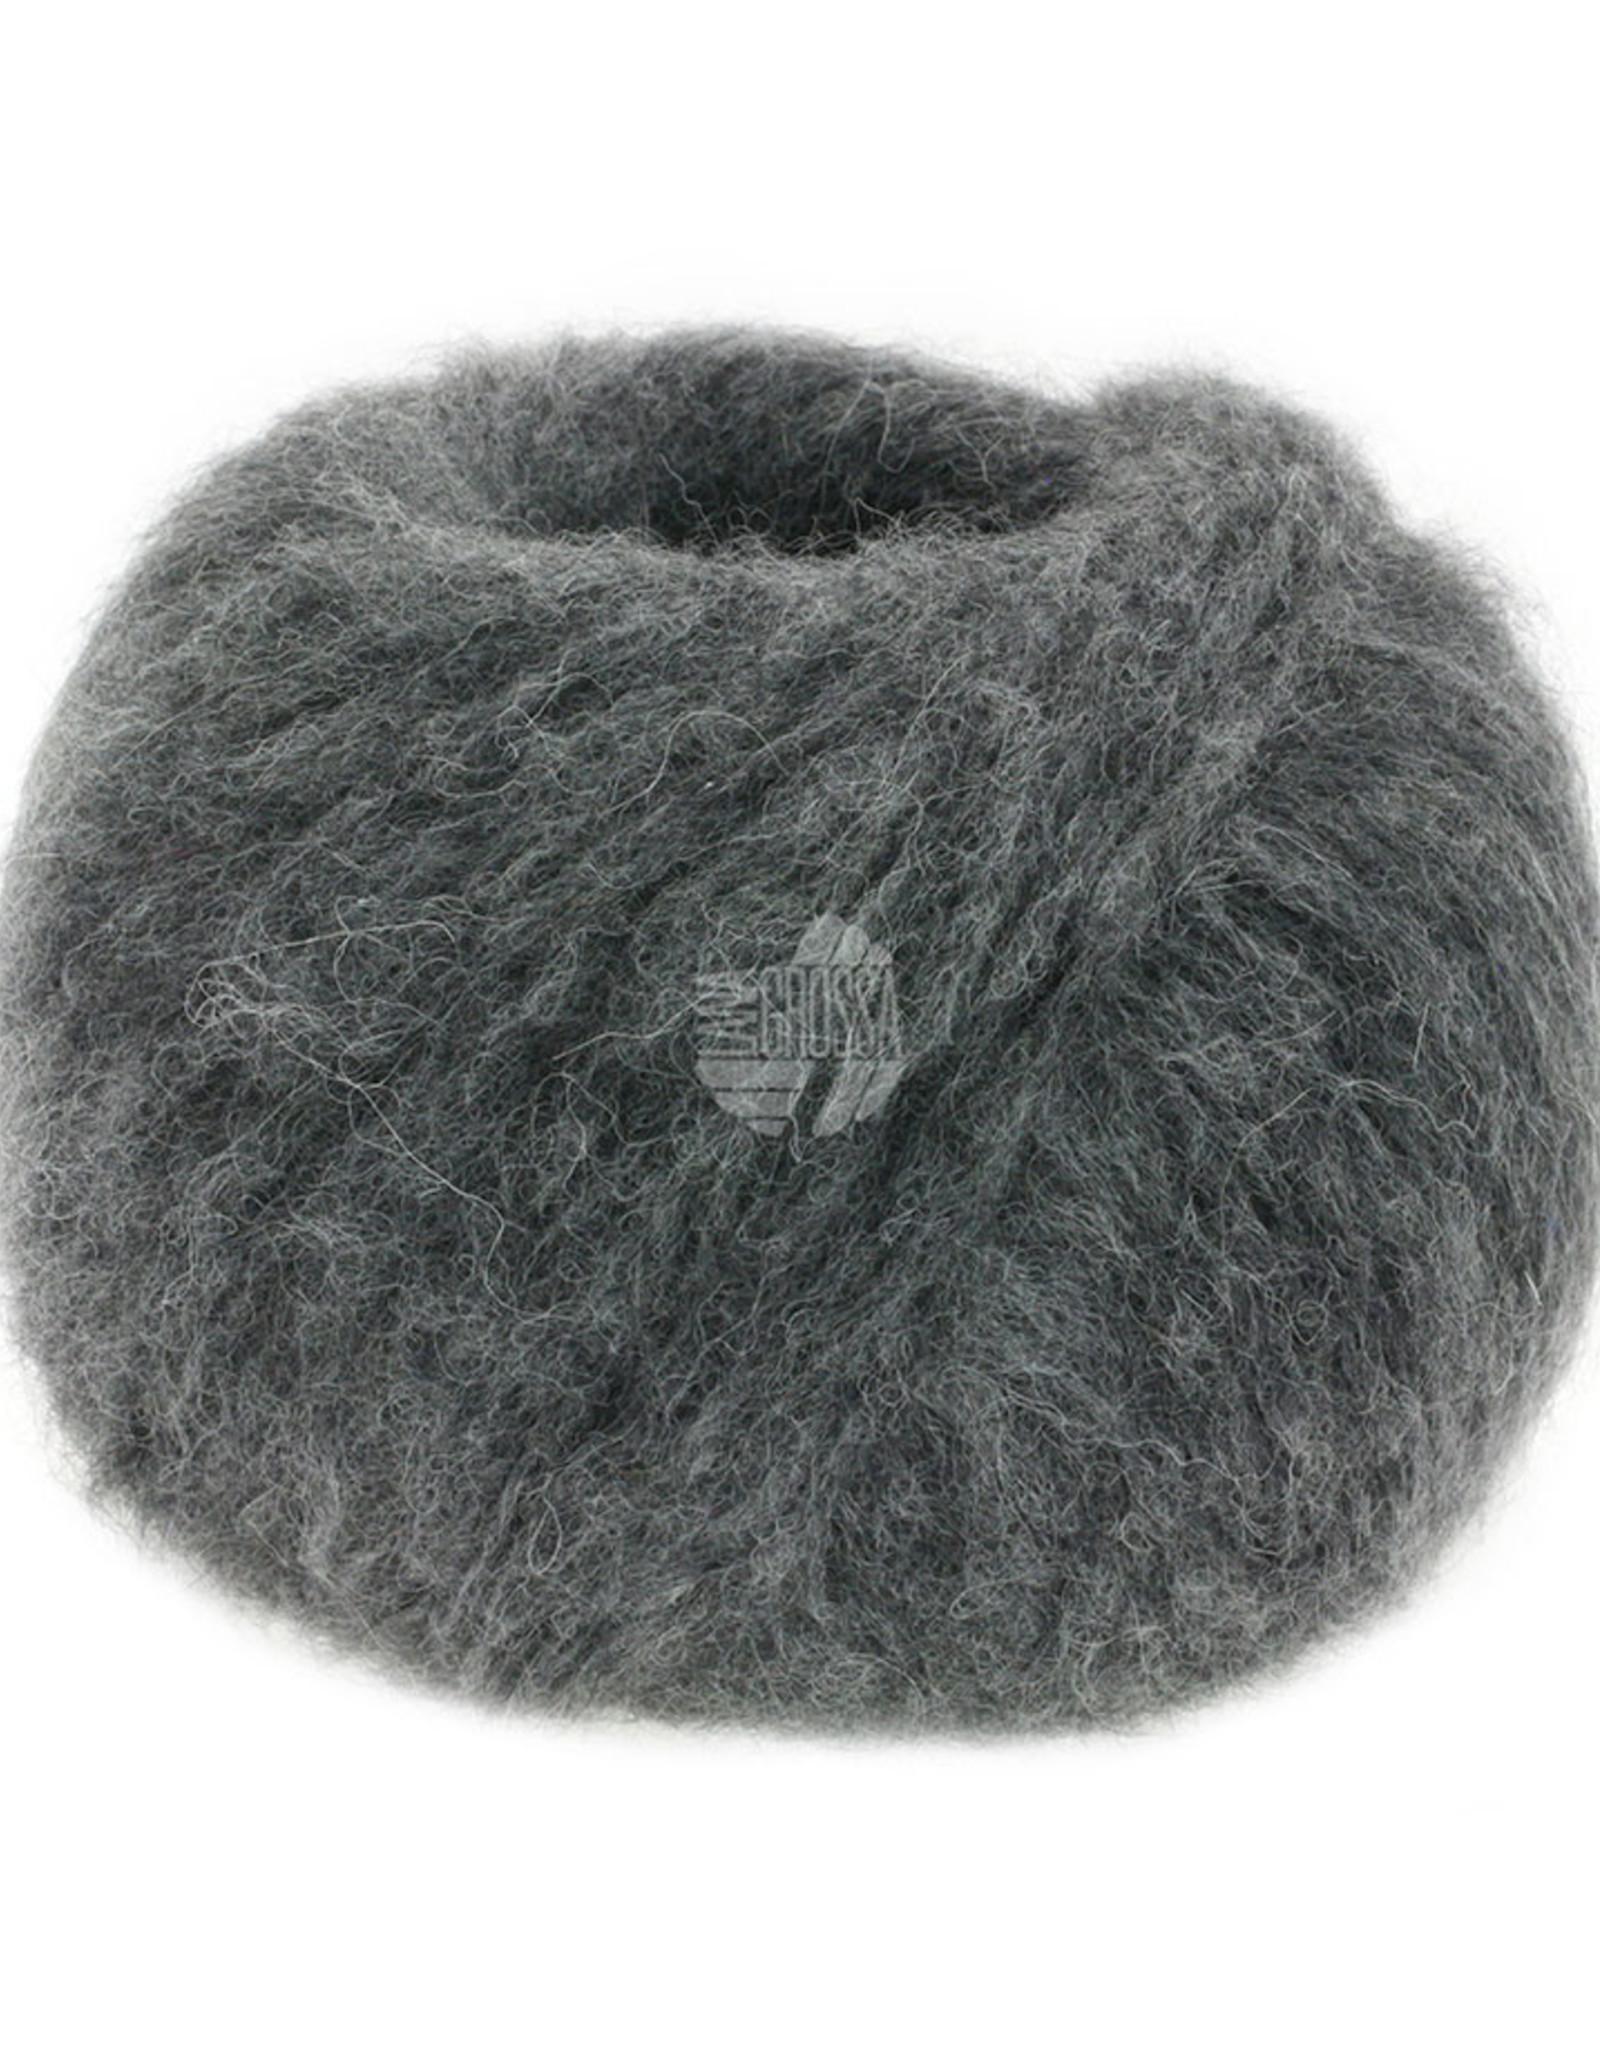 Lana Grossa Alpaca Moda vest